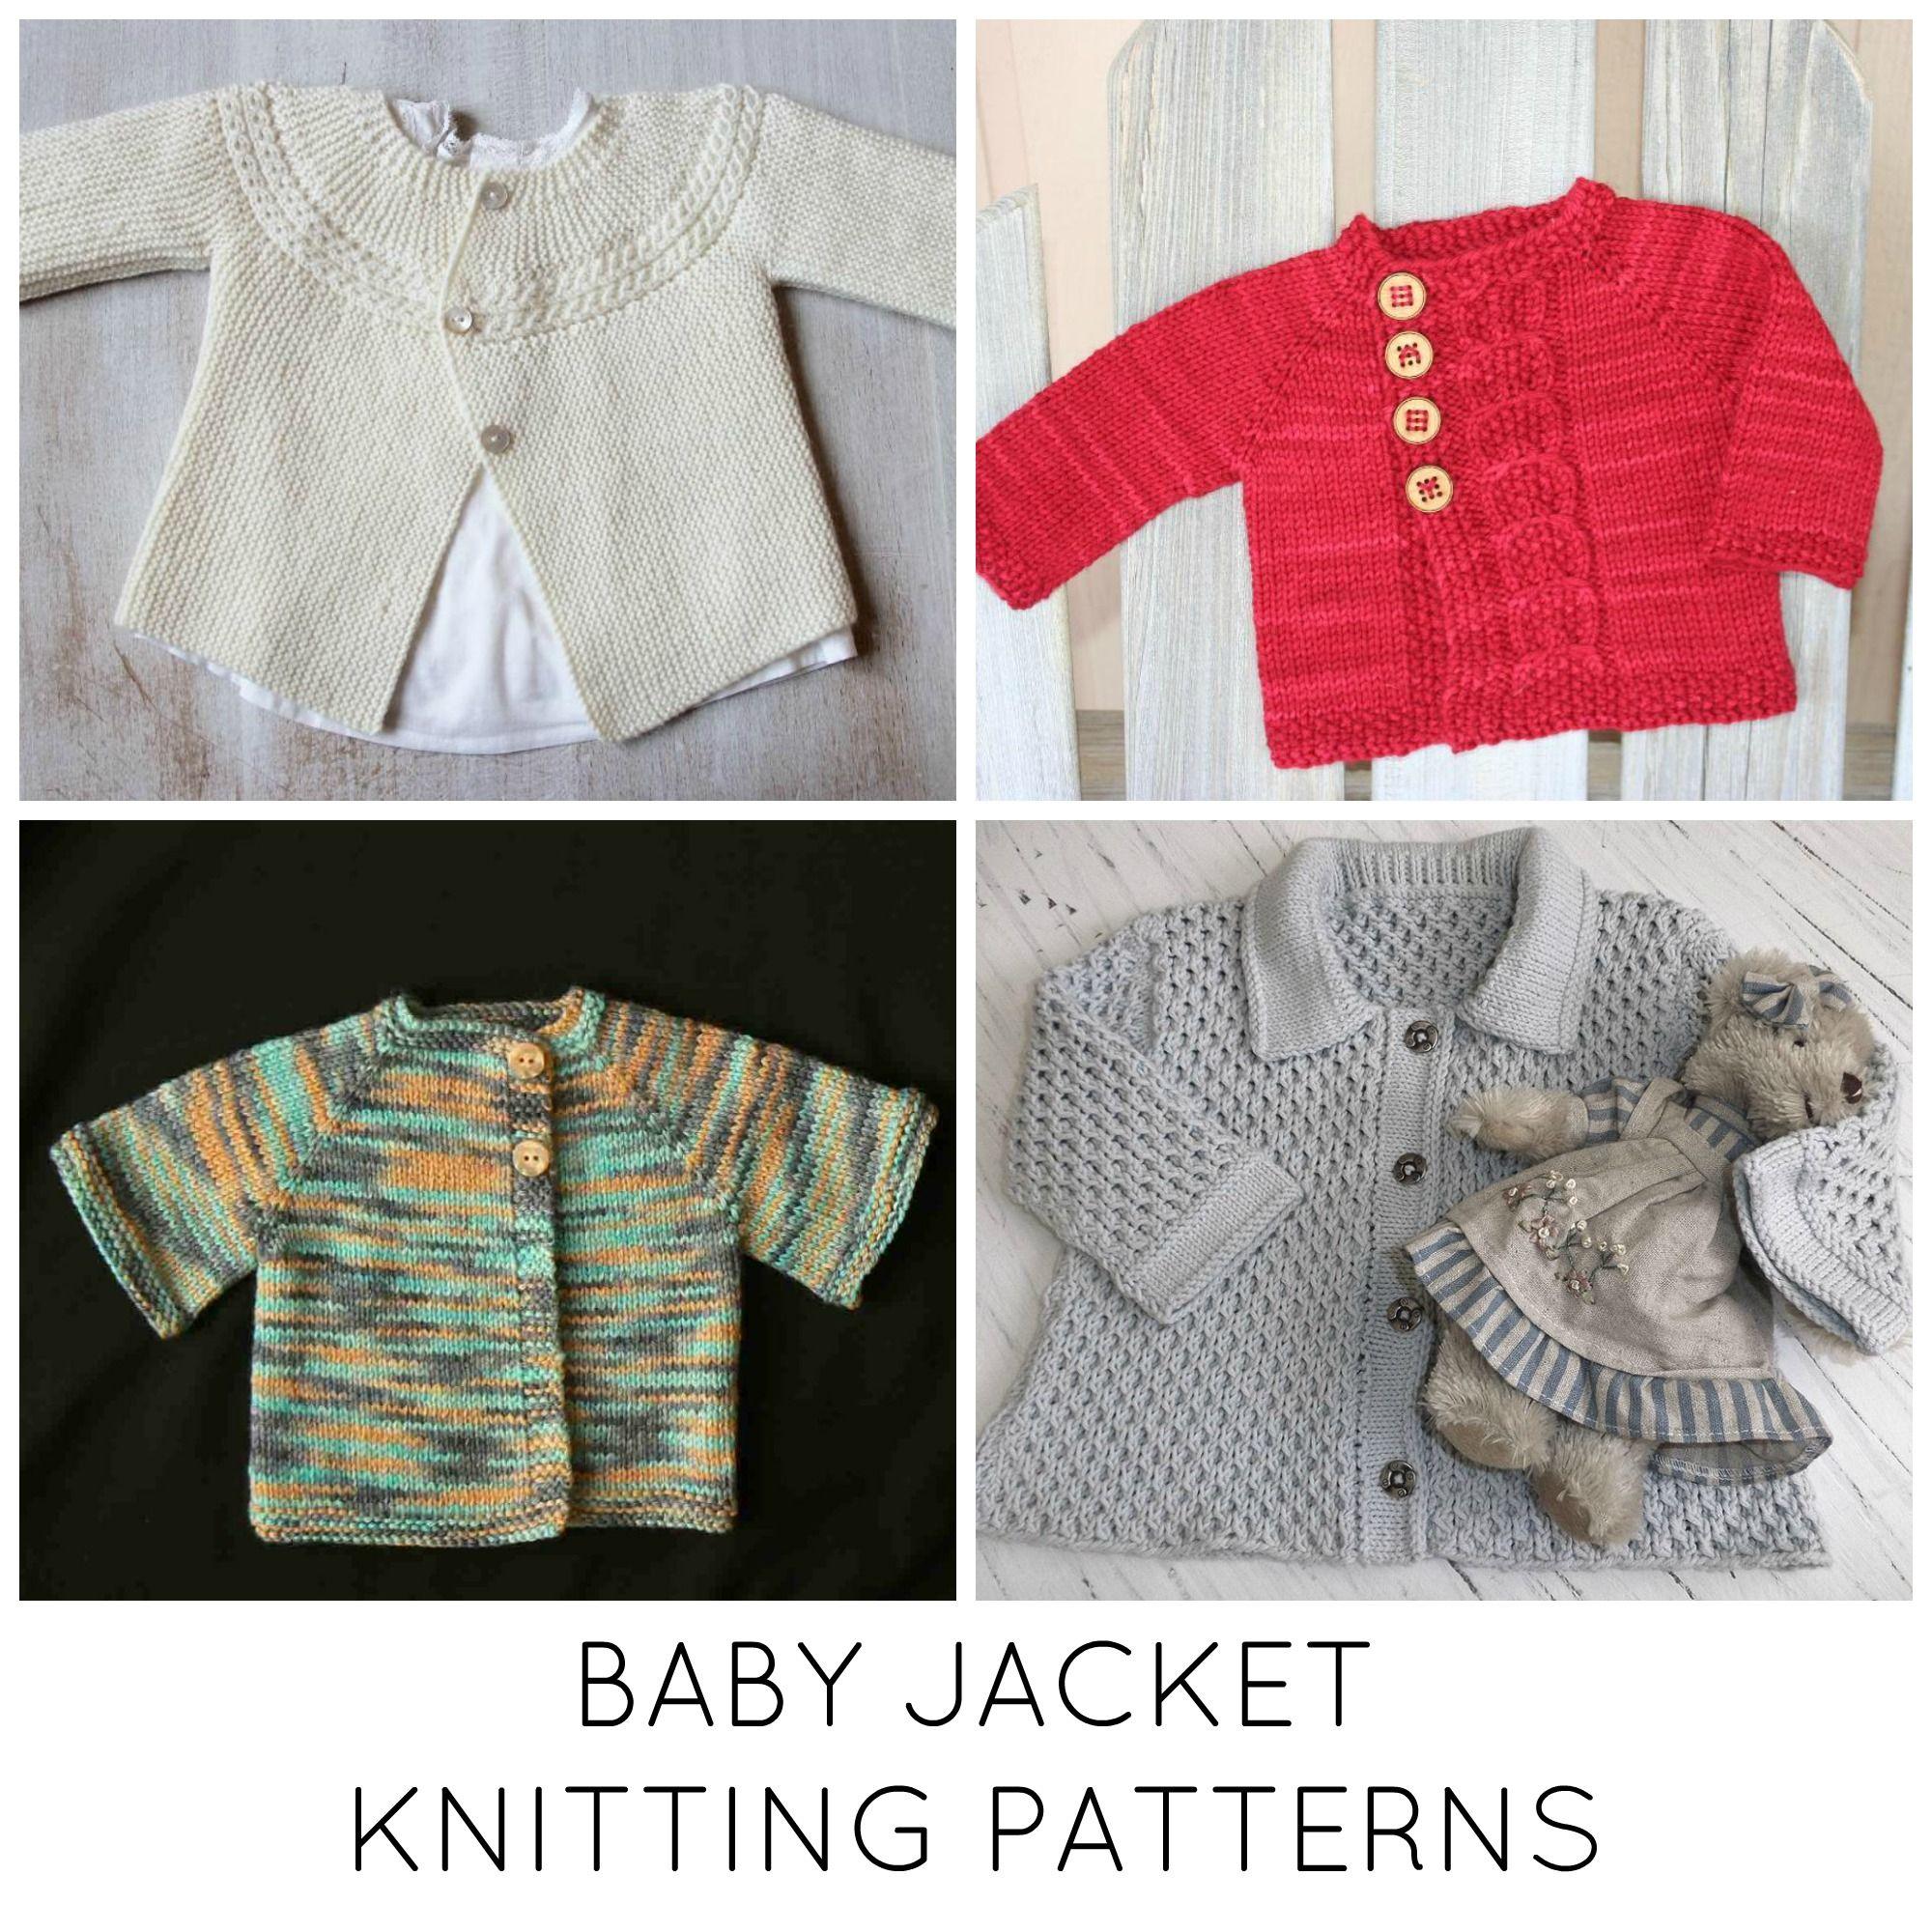 10 Baby Jacket Knitting Patterns You\'ll Love   Knit patterns, Baby ...